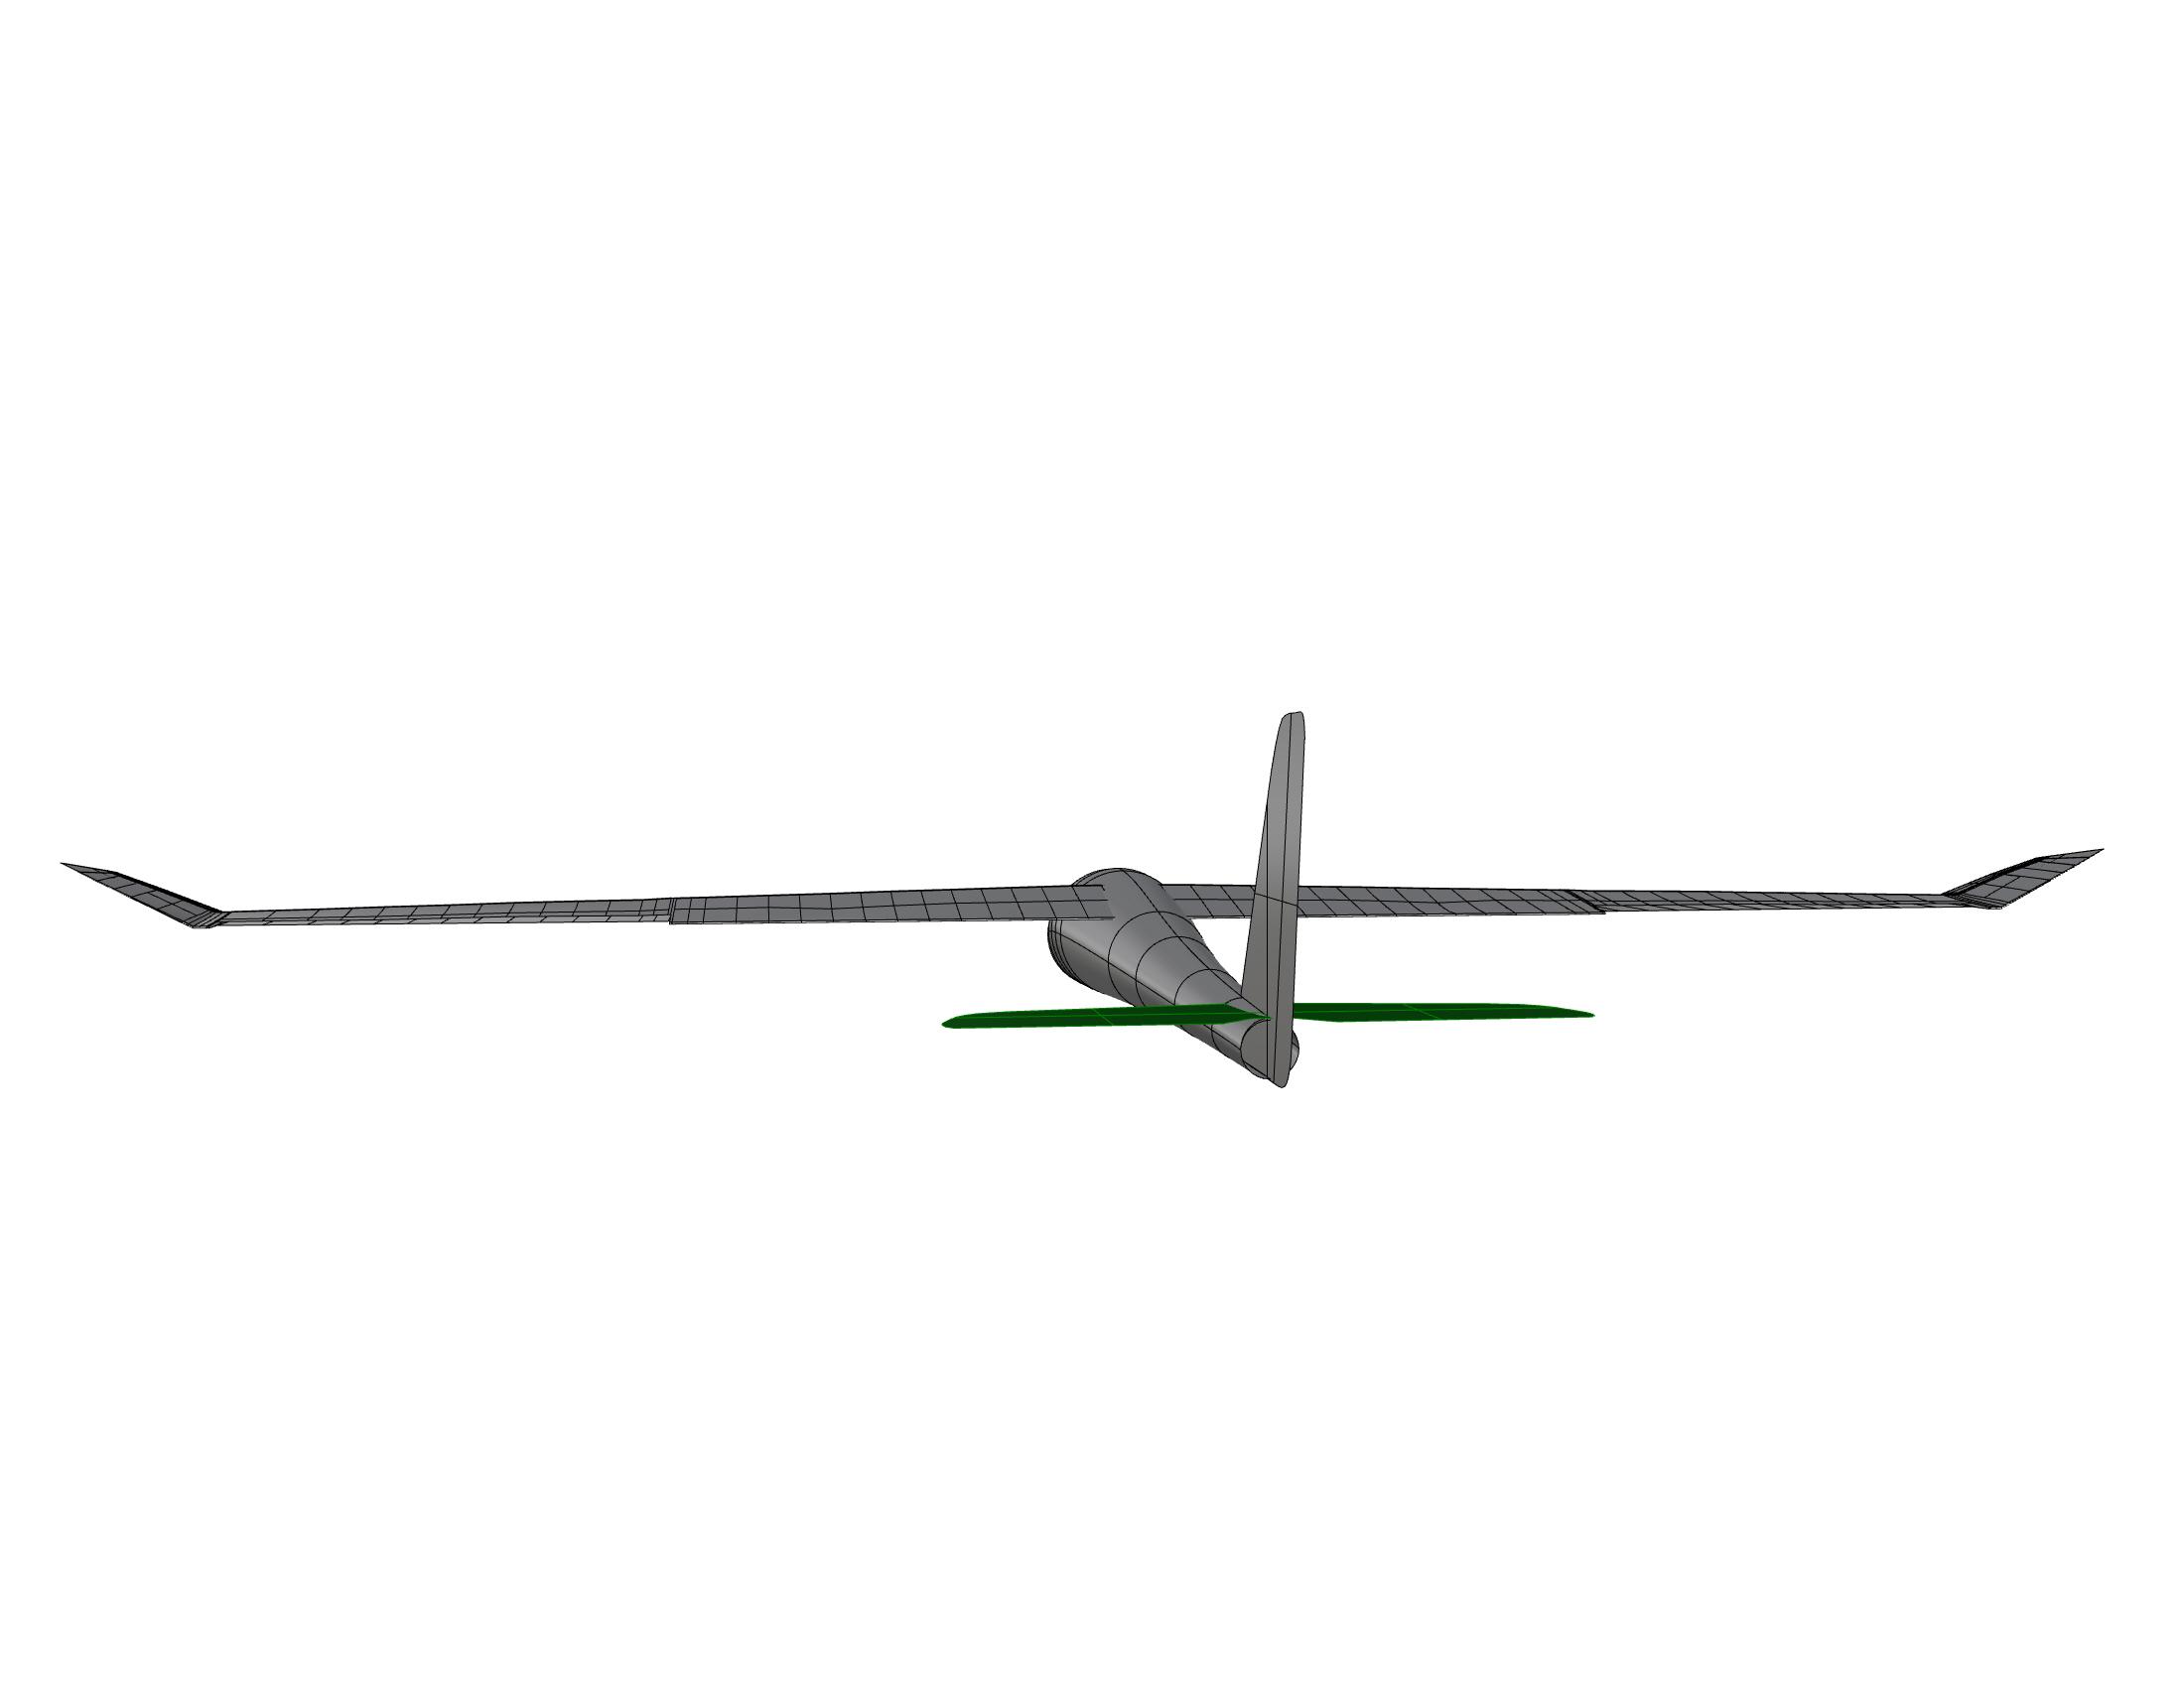 3D Model Picture 7.jpg